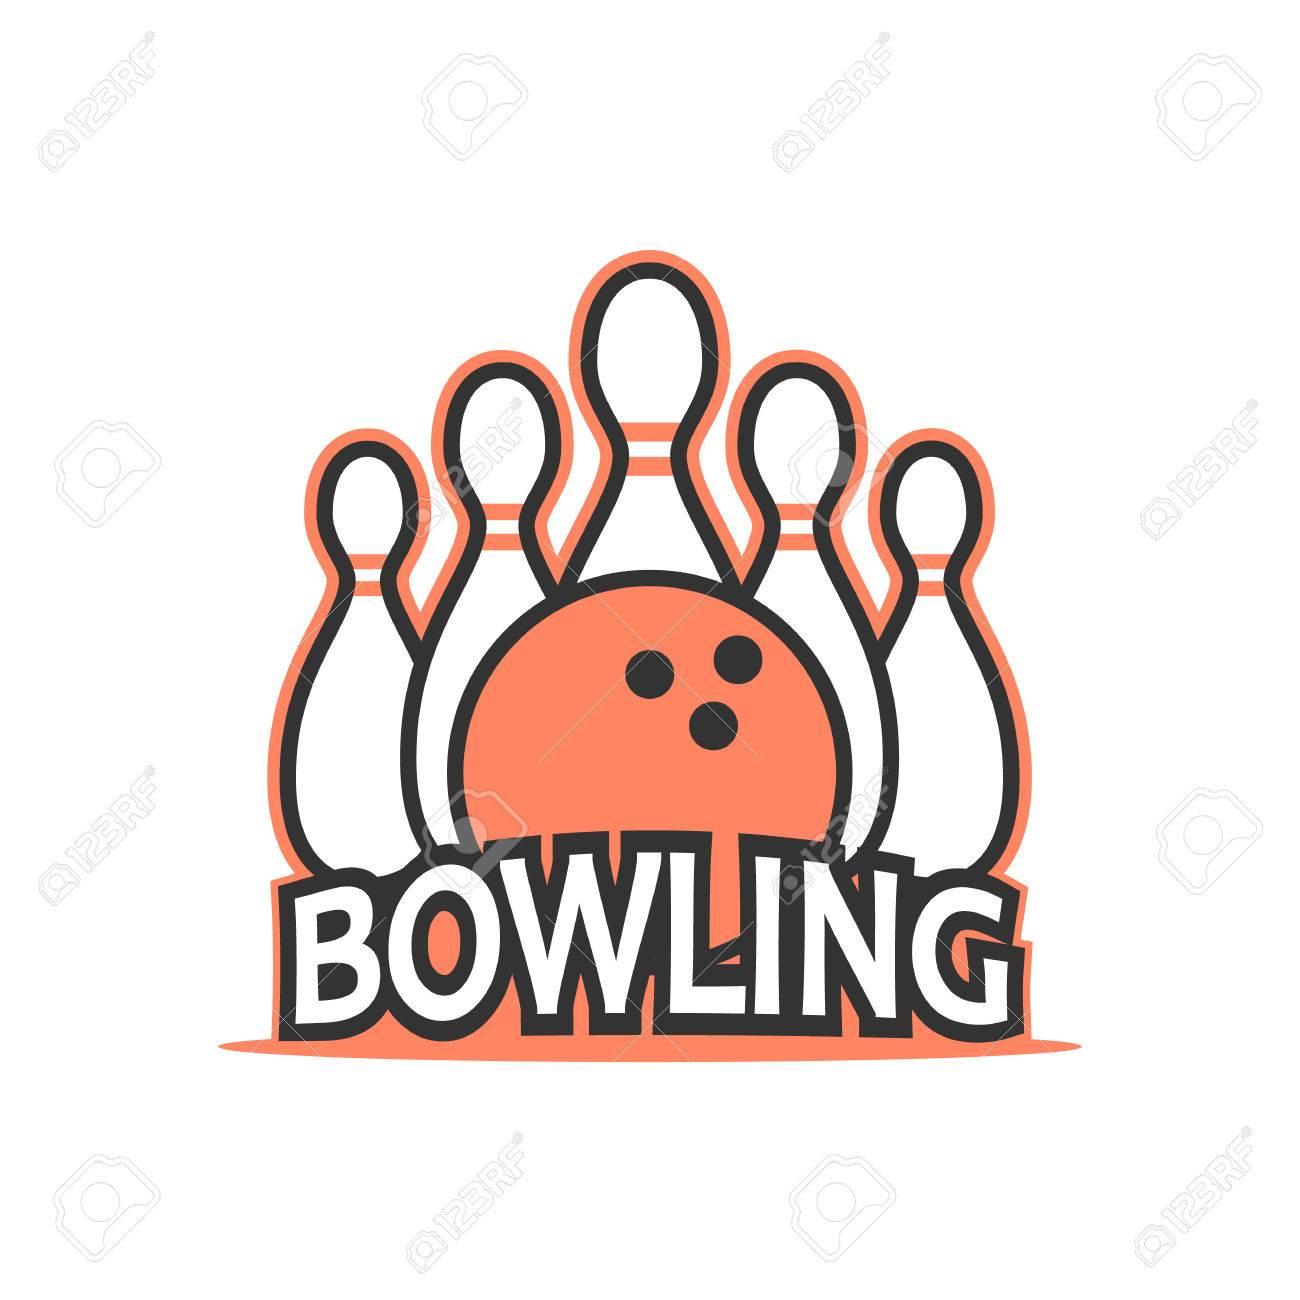 bowling club logo royalty free cliparts vectors and stock rh 123rf com bowling logopedia bowling logopedia